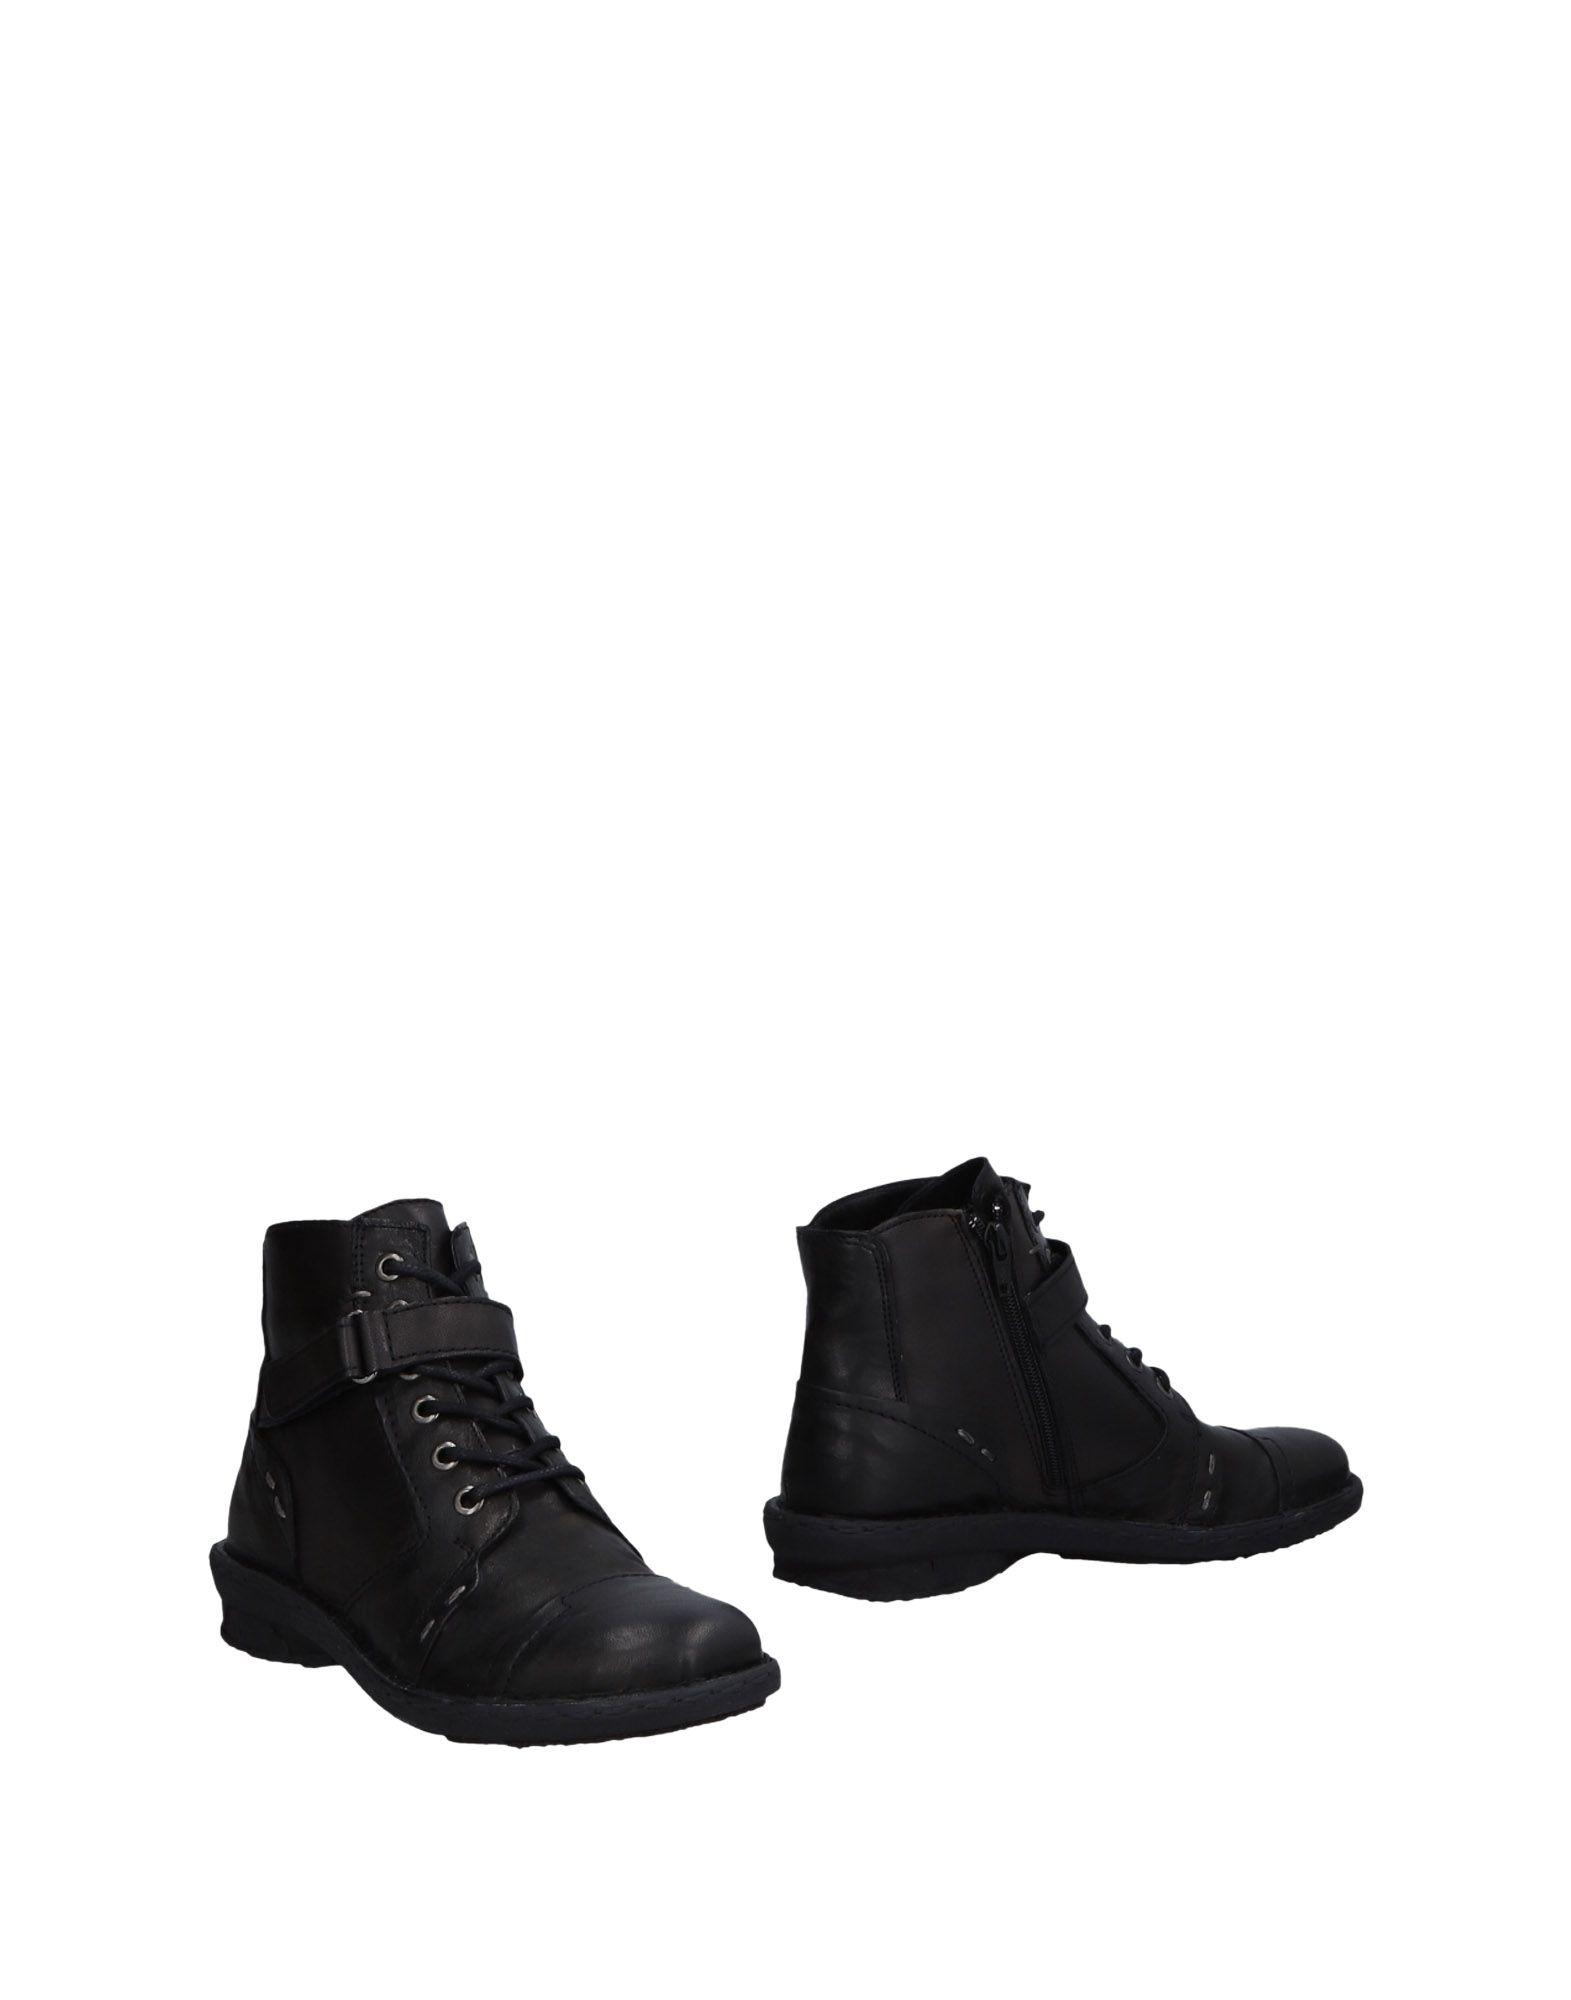 Khrio - Γυναικείες Μπότες-Μποτάκια  c6fd9342558